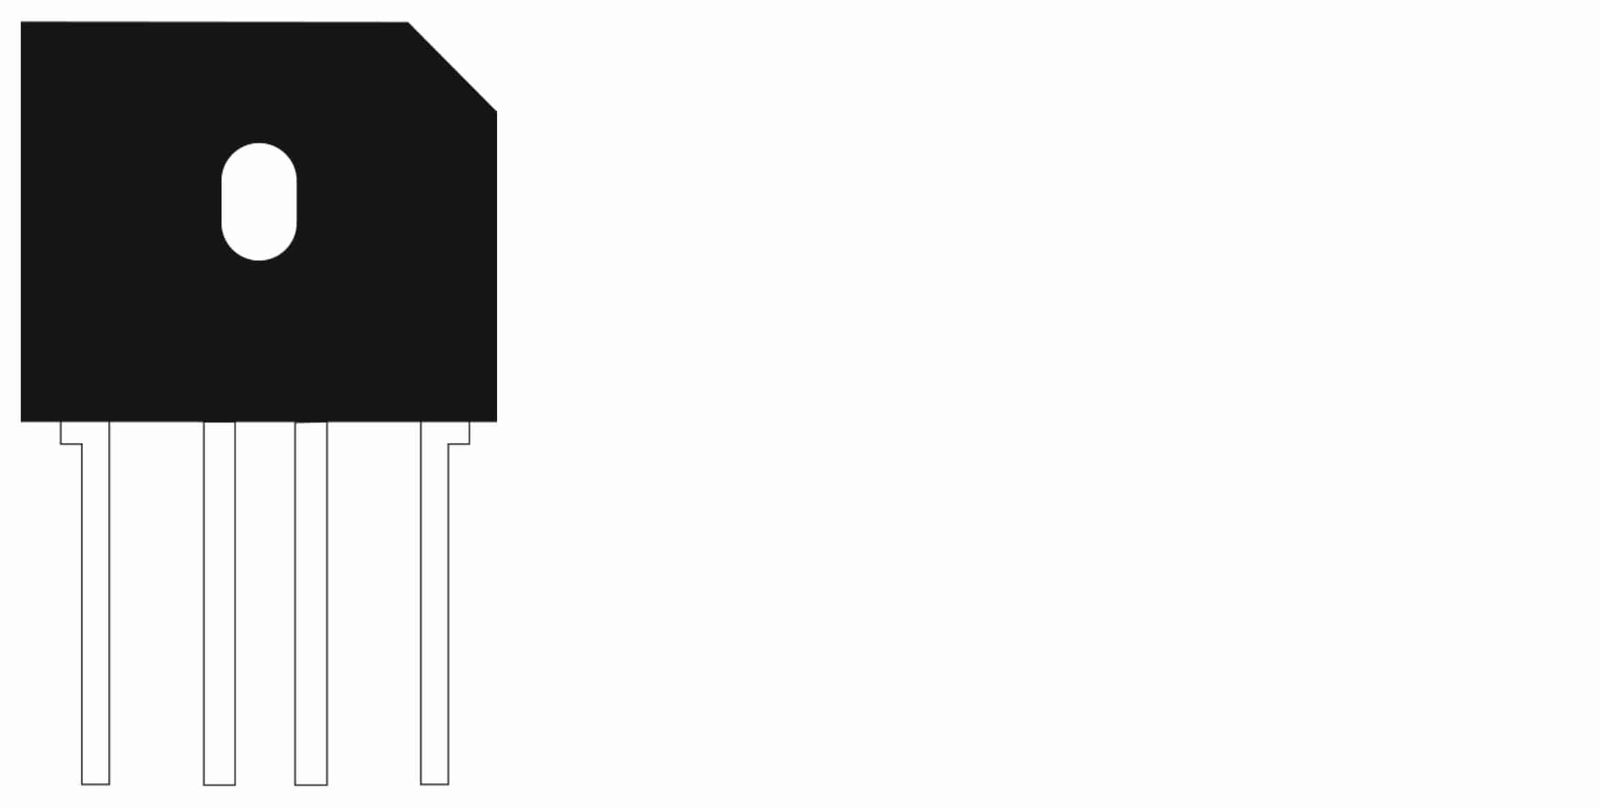 10Stk Diode 10A10 Gleichrichter 10A 1000V 10A1000V Gehäuse R-6